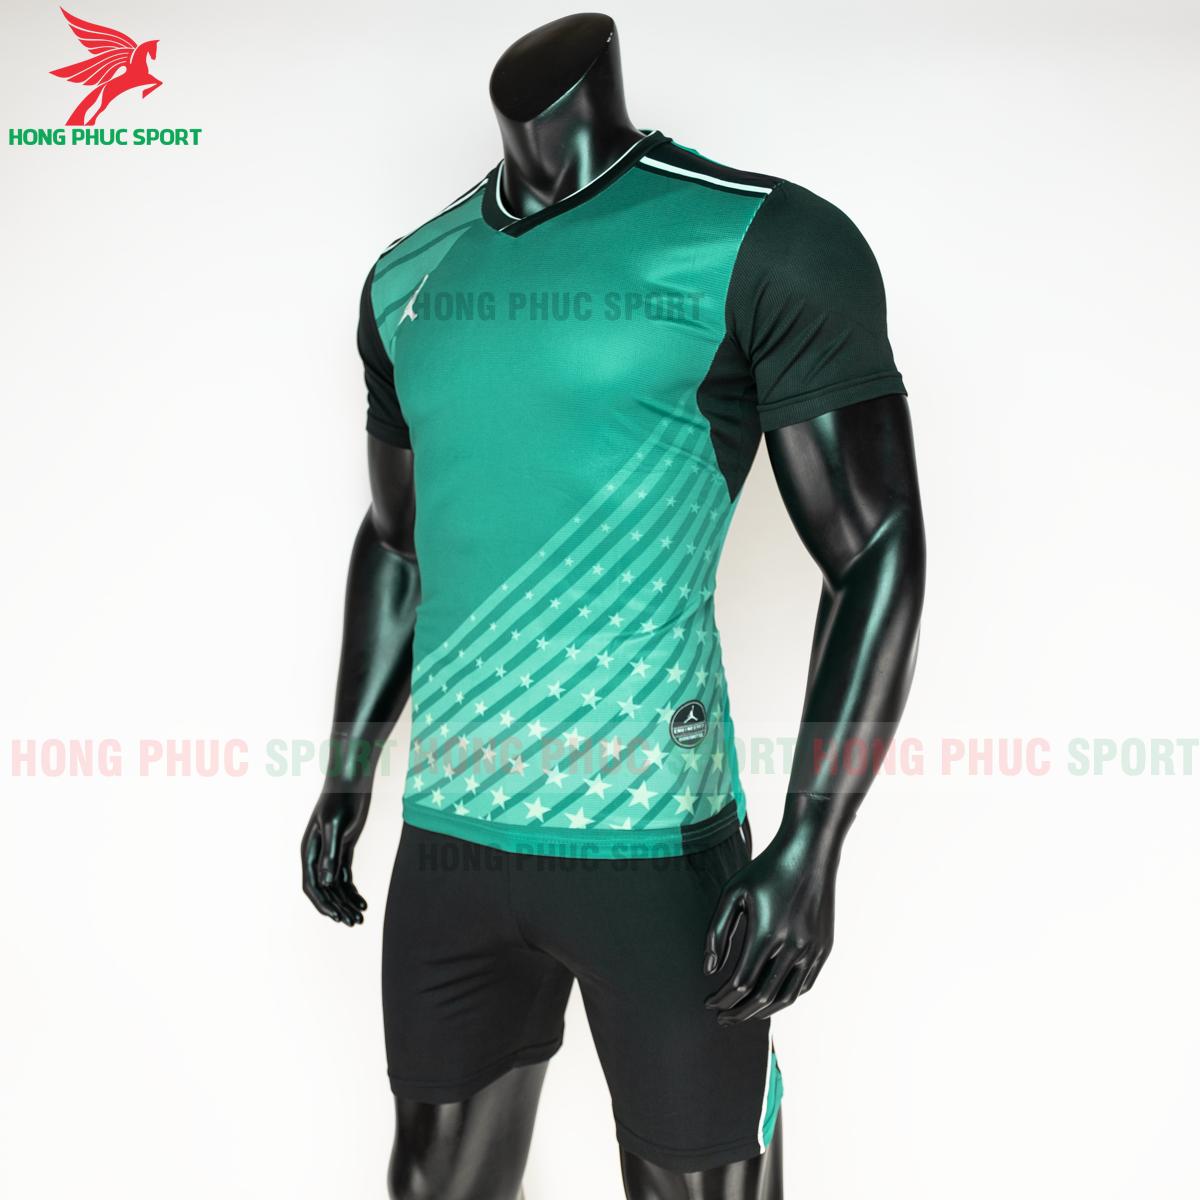 https://cdn.hongphucsport.com/unsafe/s4.shopbay.vn/files/285/ao-bong-chuyen-jordan-20-21-hang-det-mau3-4-5faf43be37138.png